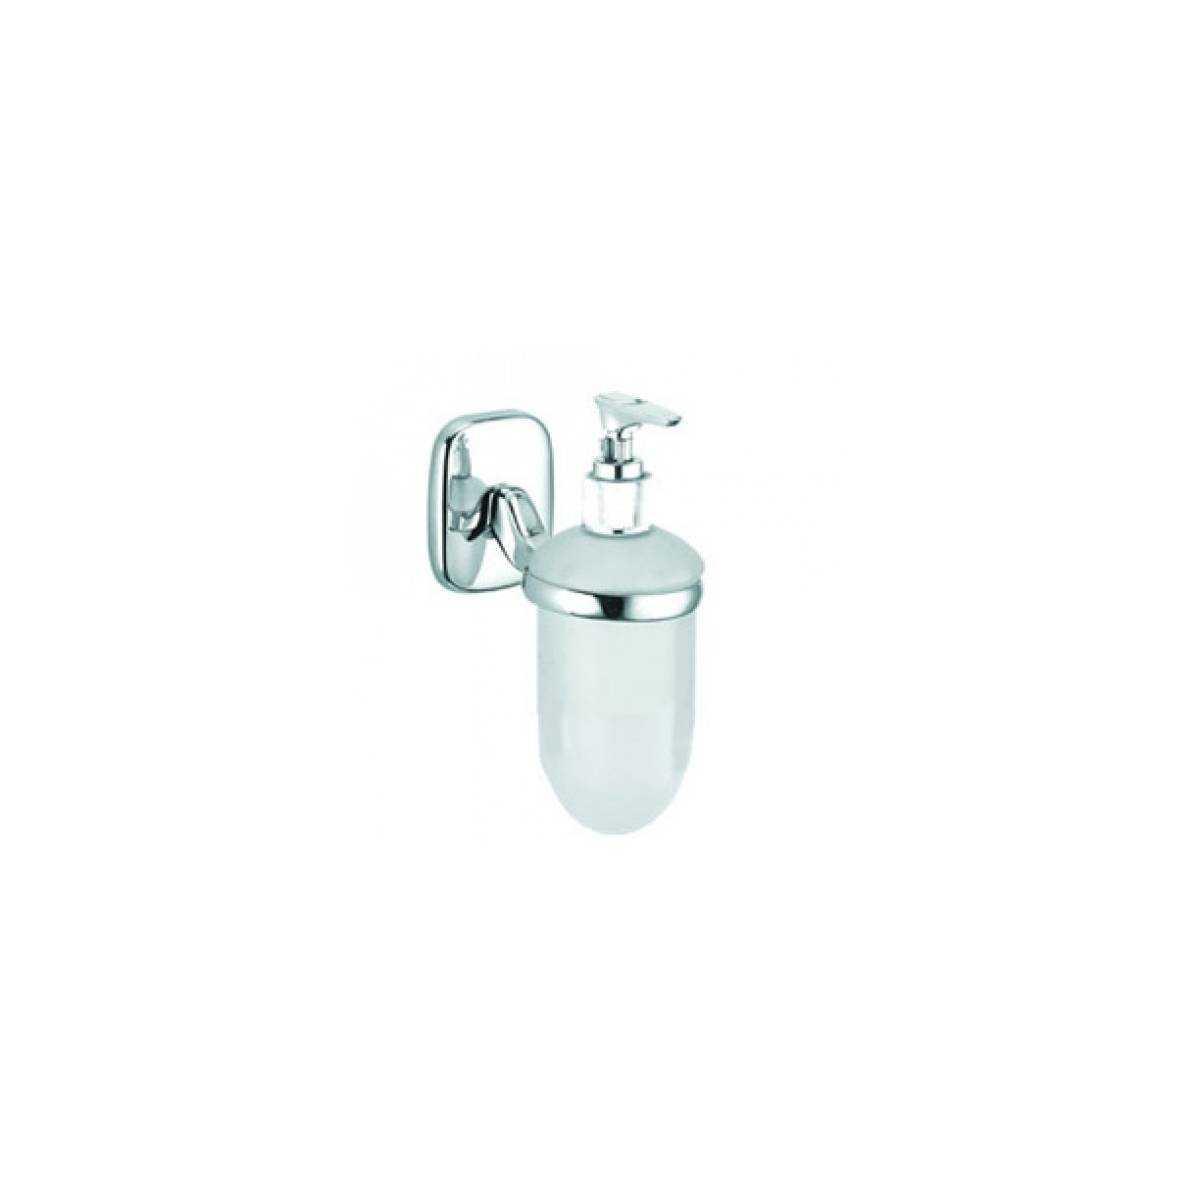 Дозатор жидкого мыла GATTO (7279) 7279 Gatto